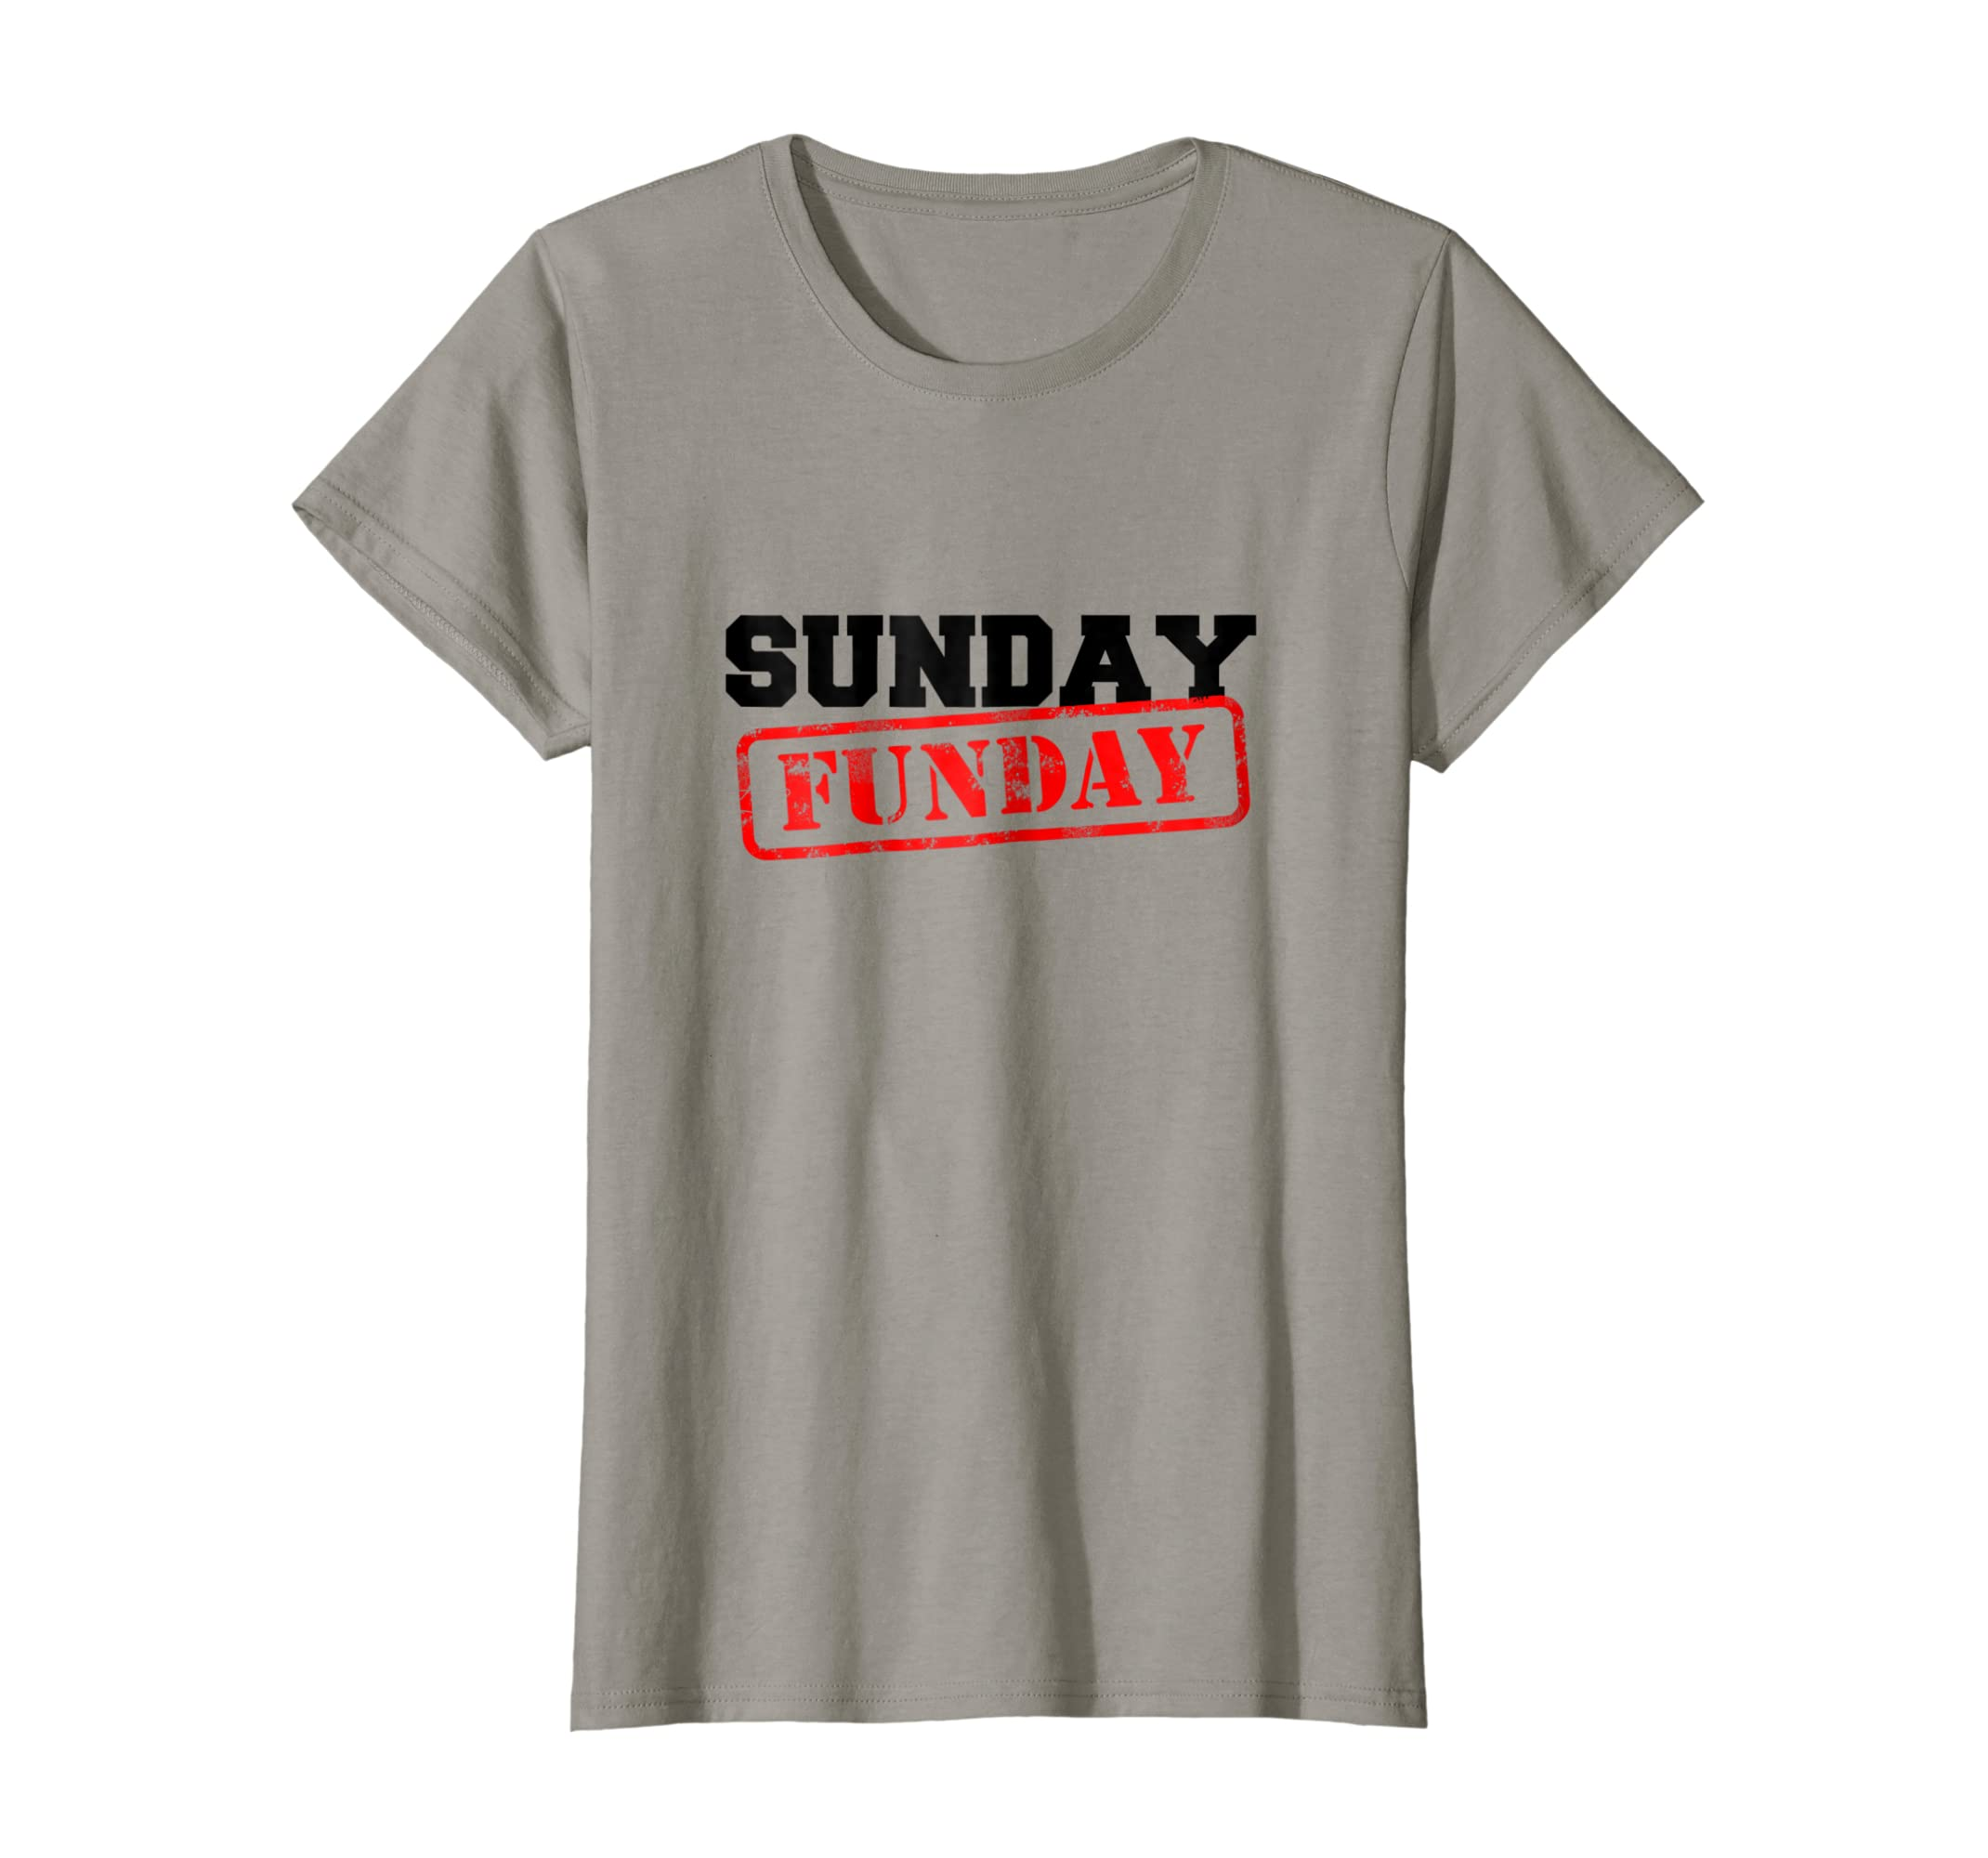 3fa68cc7e Amazon.com: Sunday Funday T-Shirt - Distressed Stamp Design, Men & Women:  Clothing